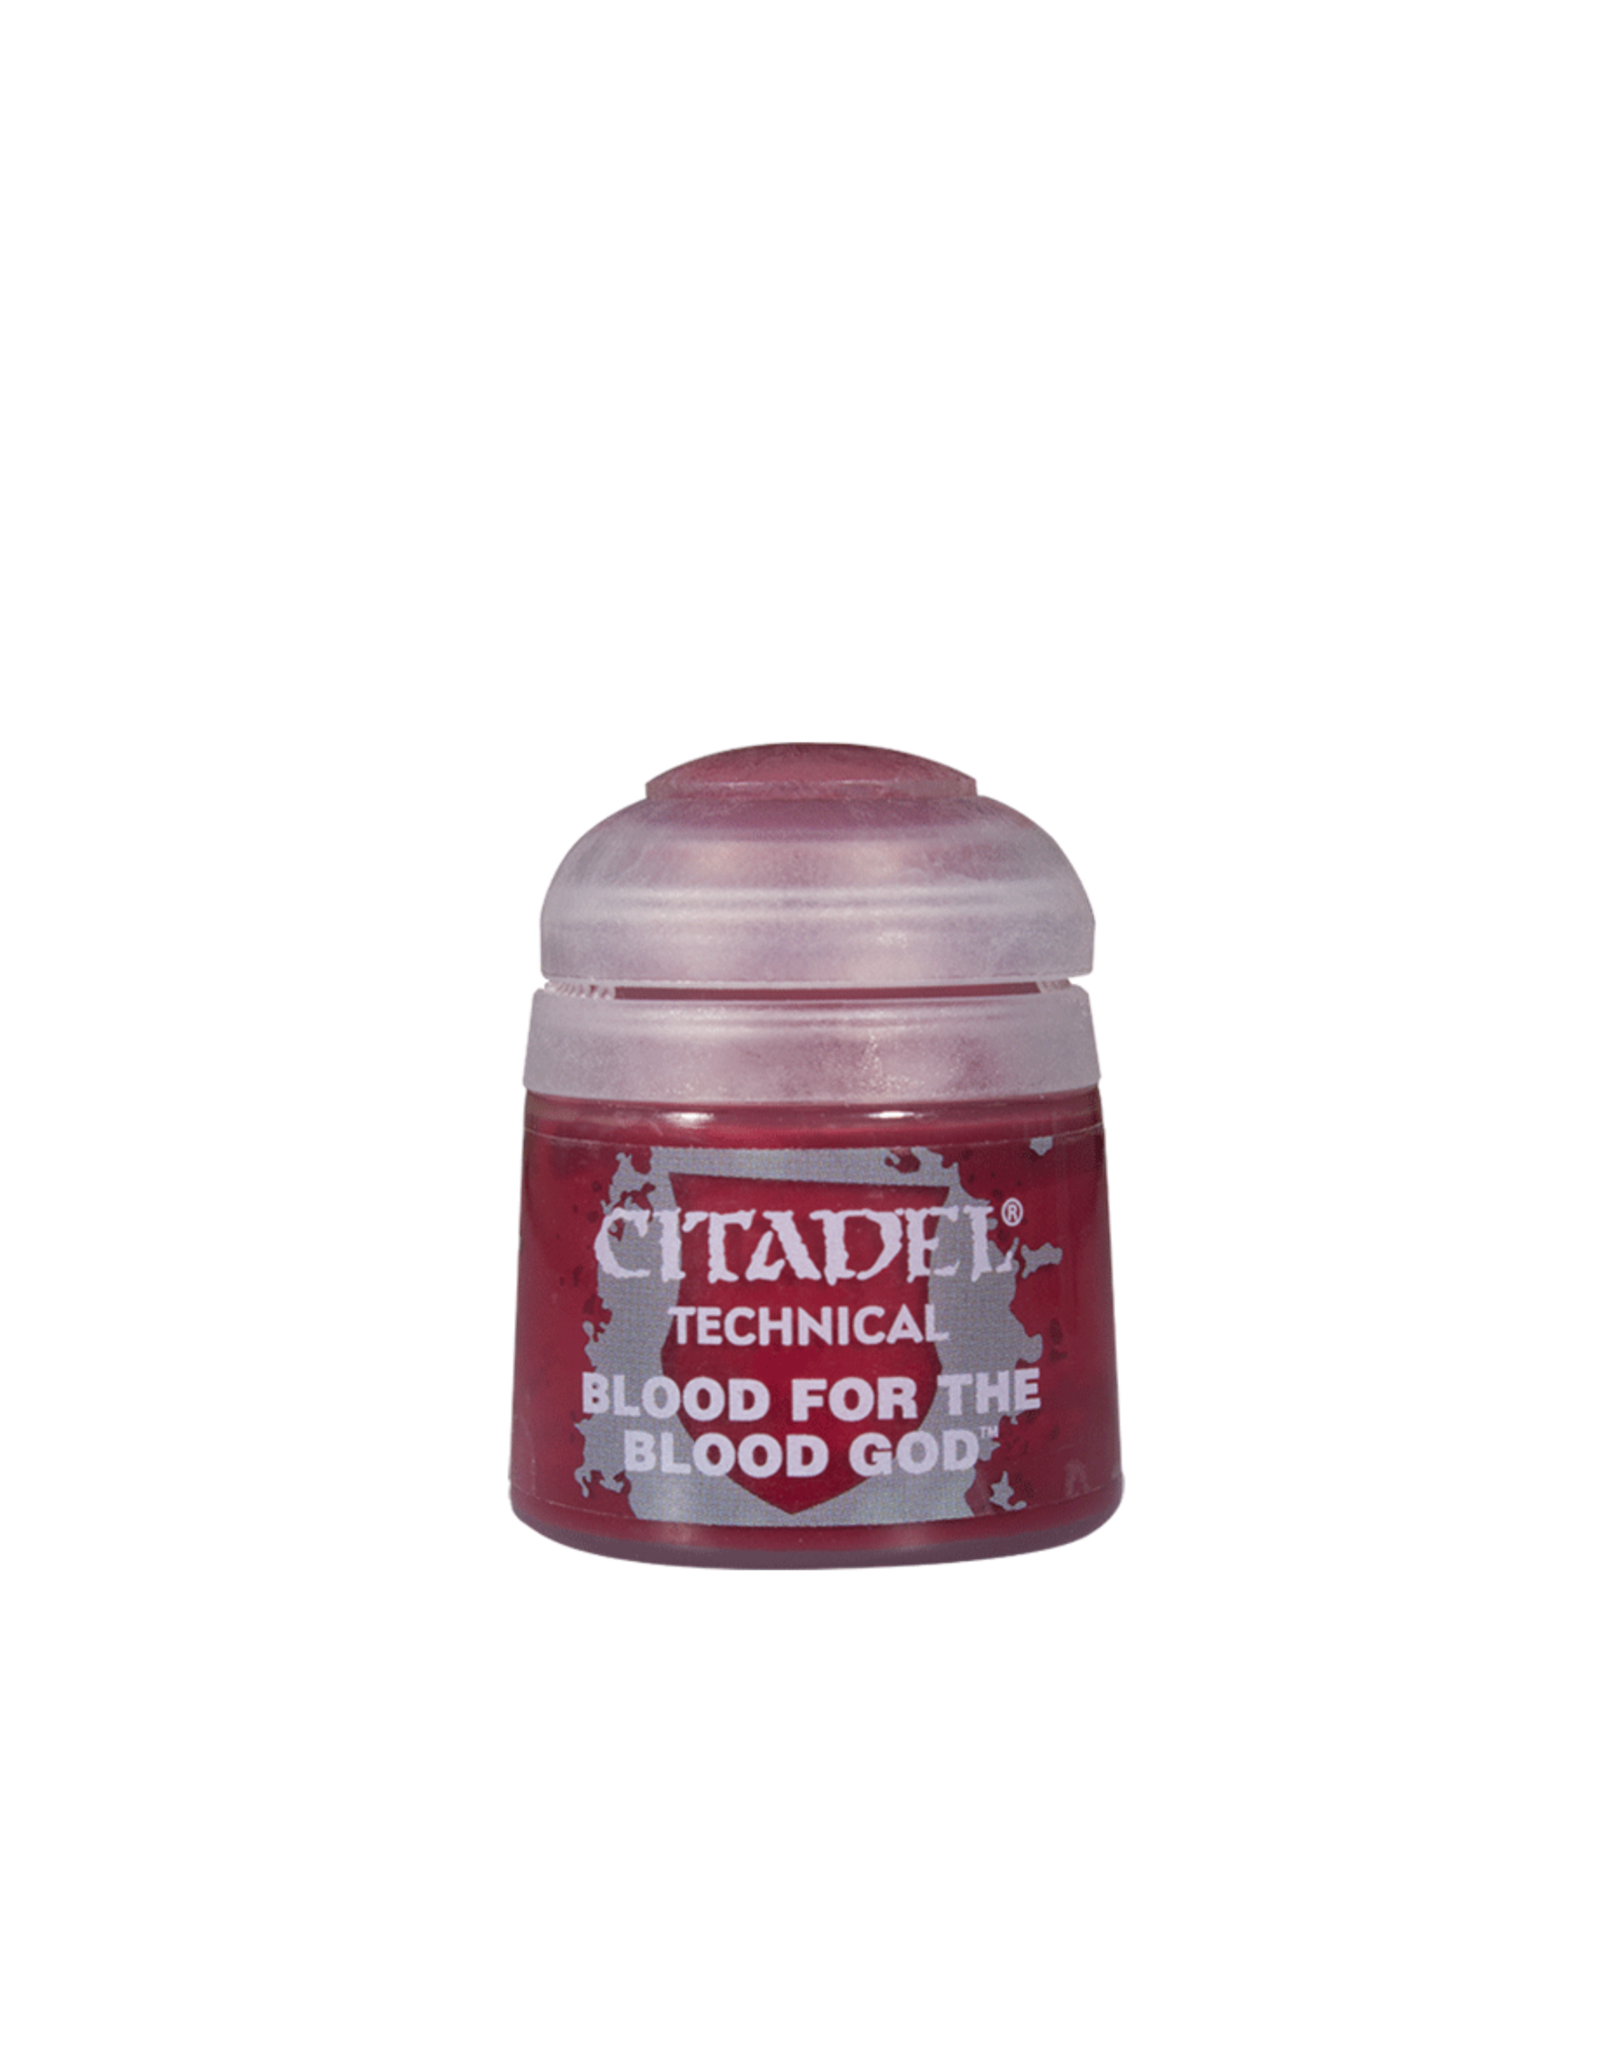 Citadel Citadel Paints Technical Paint Blood for the Blood God